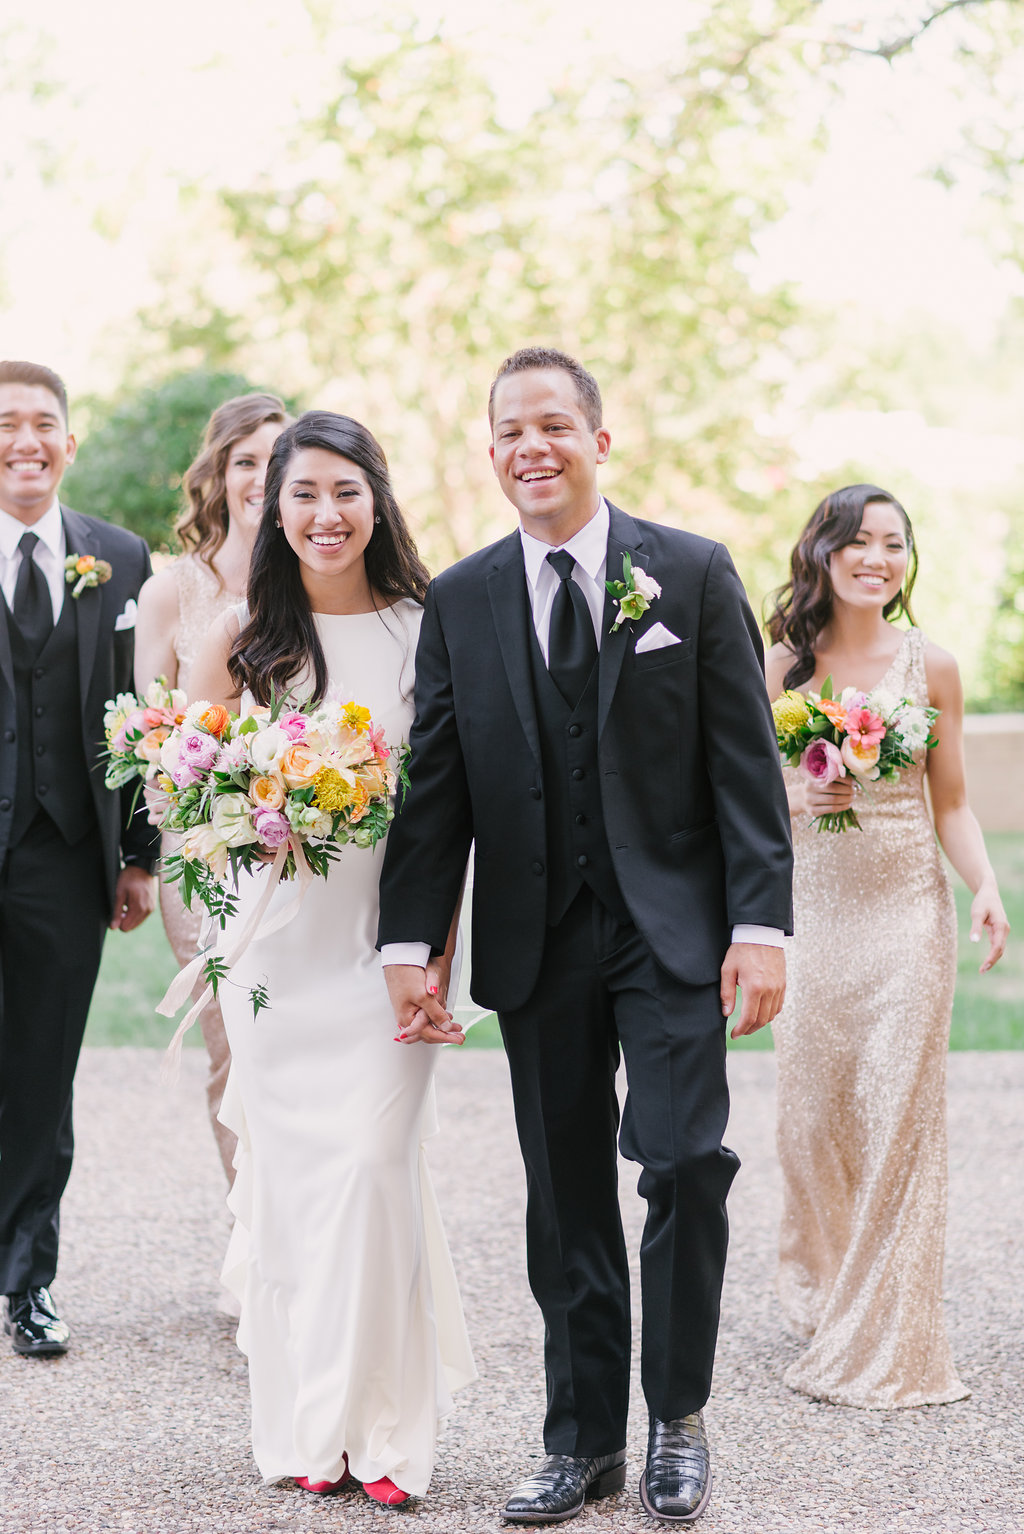 Pastel Wedding Flower Ideas - Dallas Wedding Florists